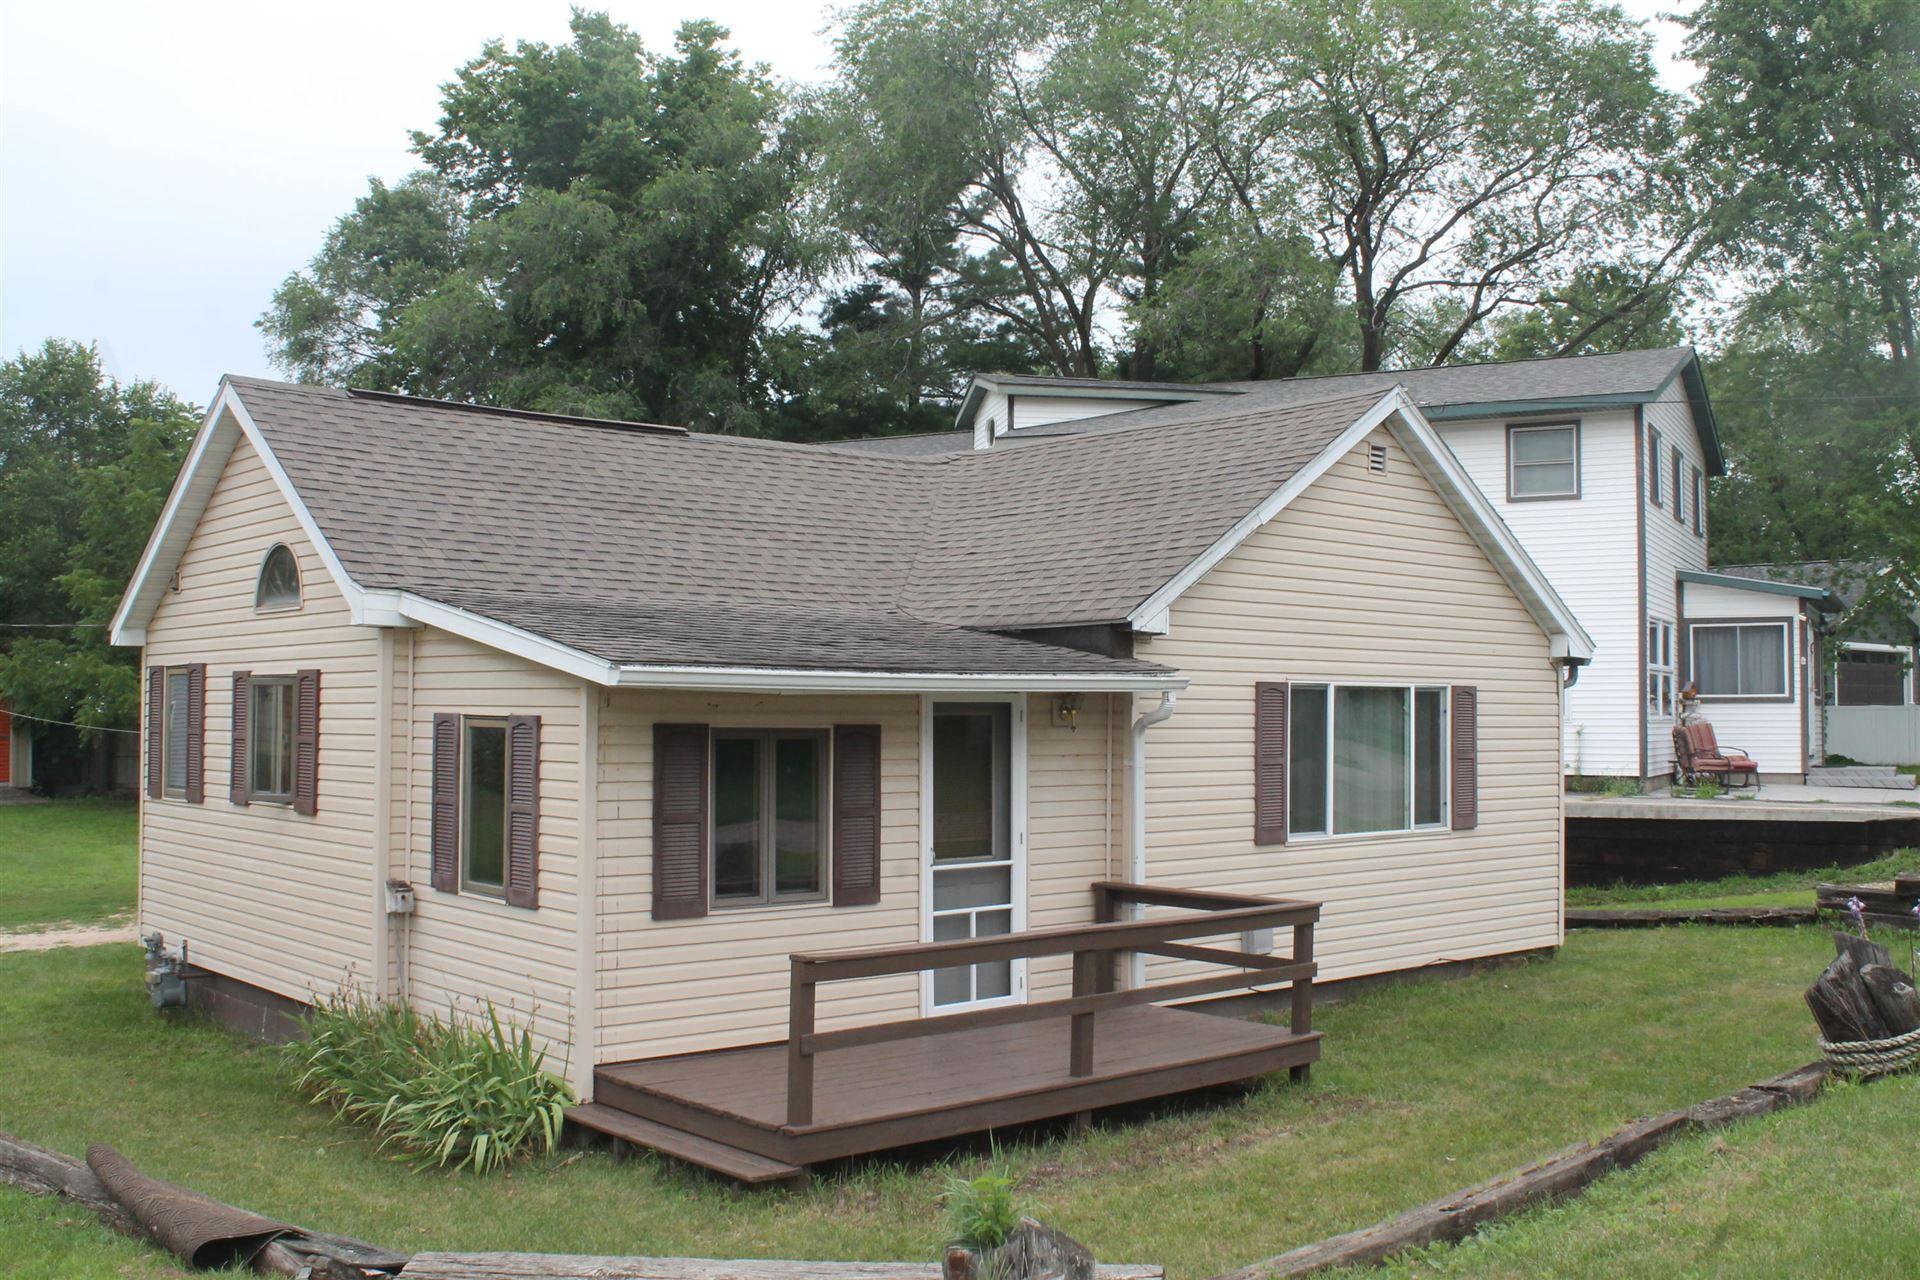 1731 La Fond Ave, Campbell, WI 54603 - MLS#: 1753699